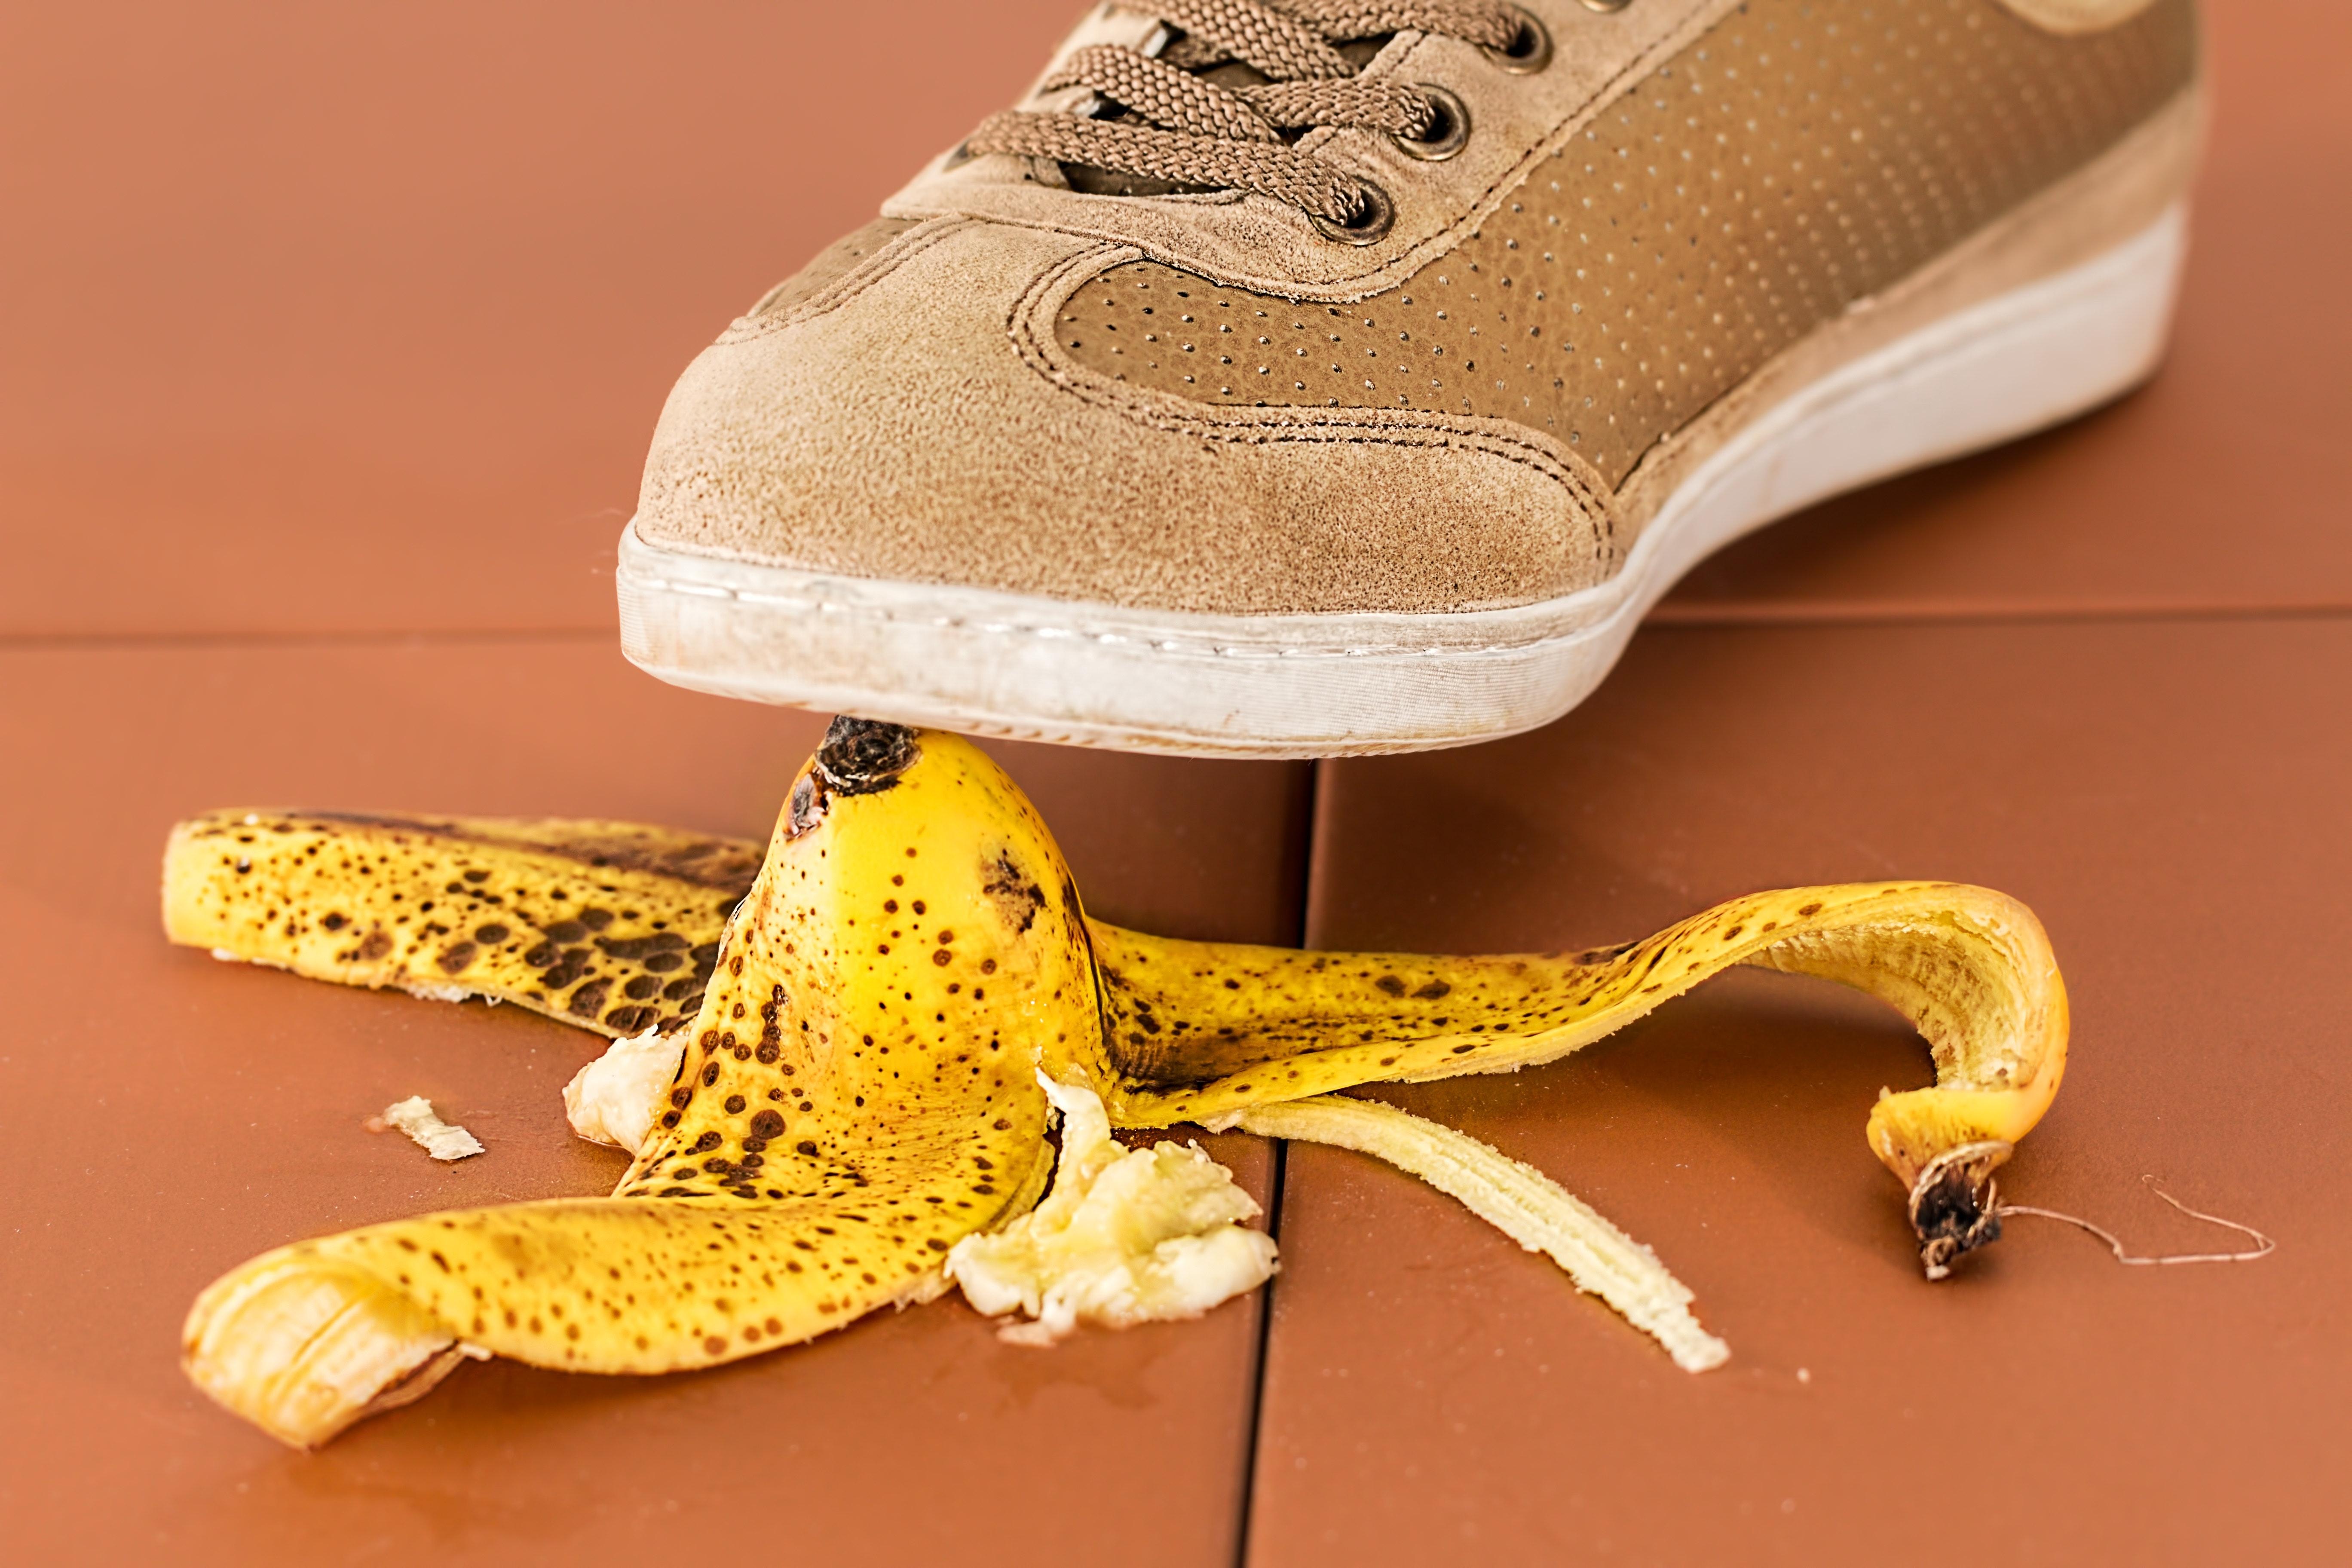 Image of a Shoe Stepping on a Banana Peel